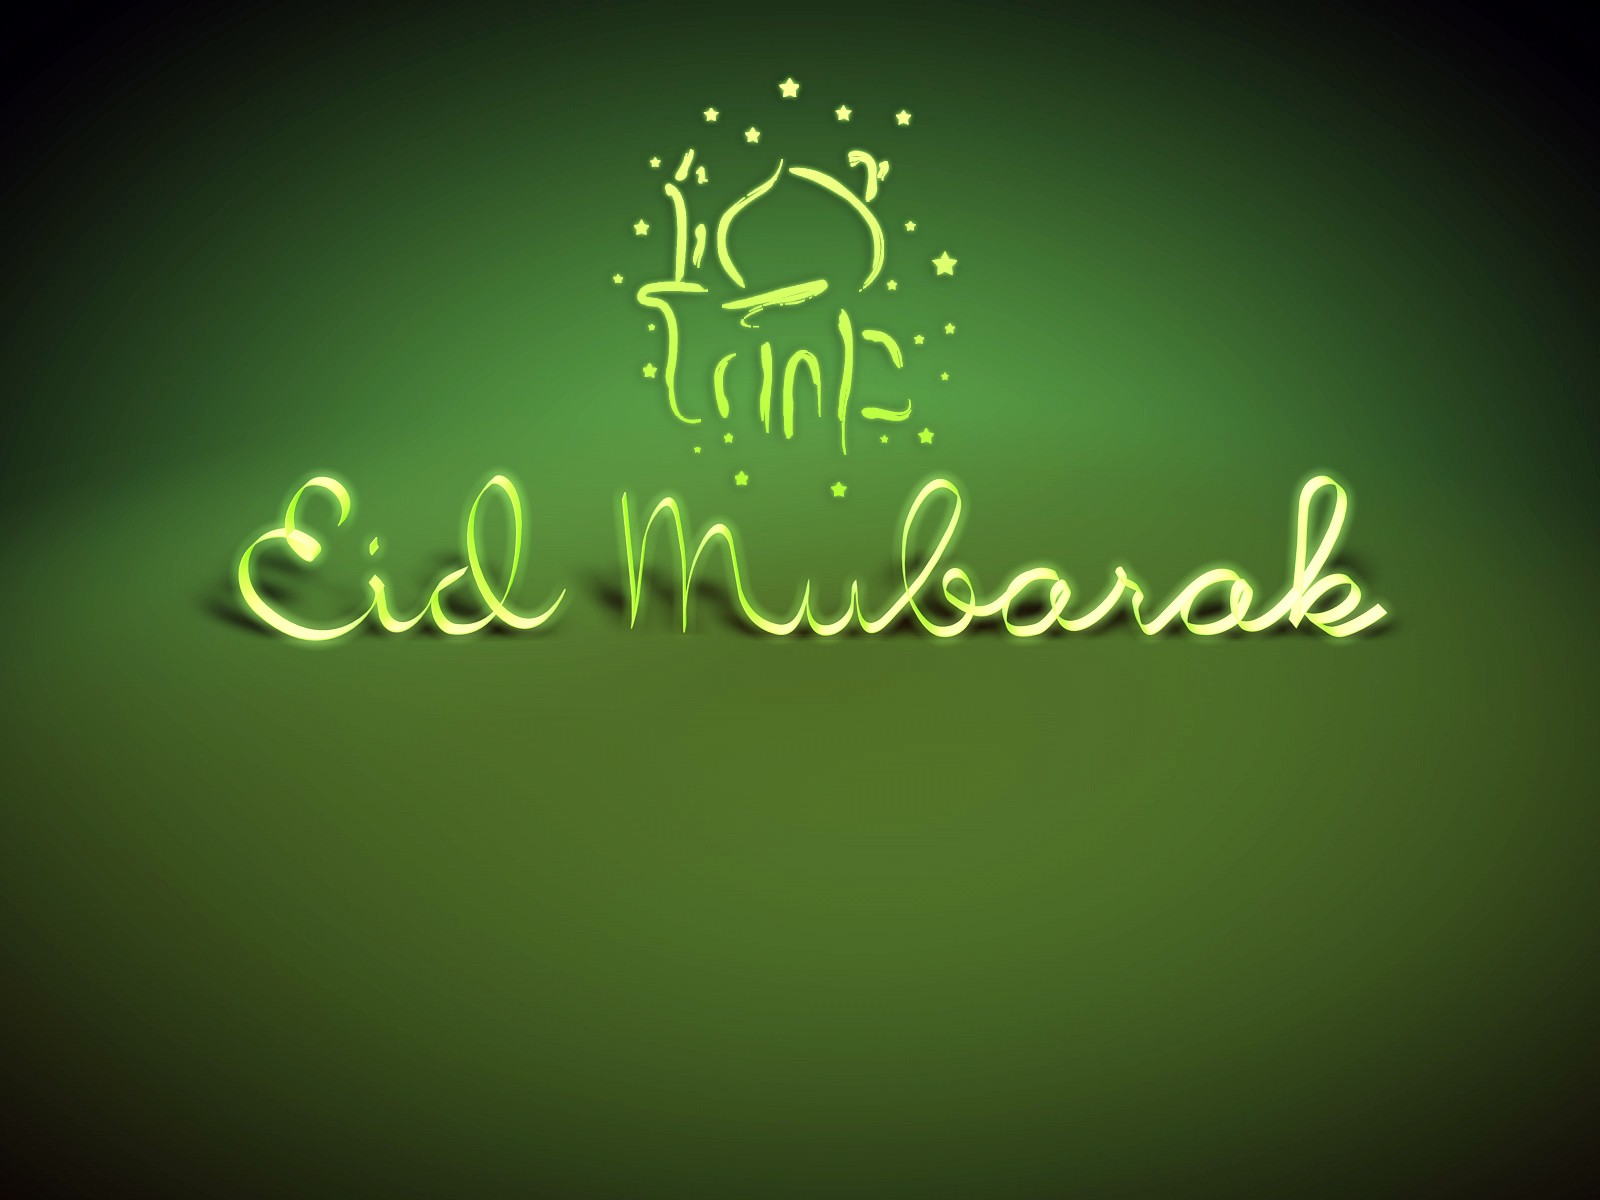 Love Eid Mubarak Wallpaper : happy-eid-mubarak-ramzan-wishes-wallpaper - Androidtutorial